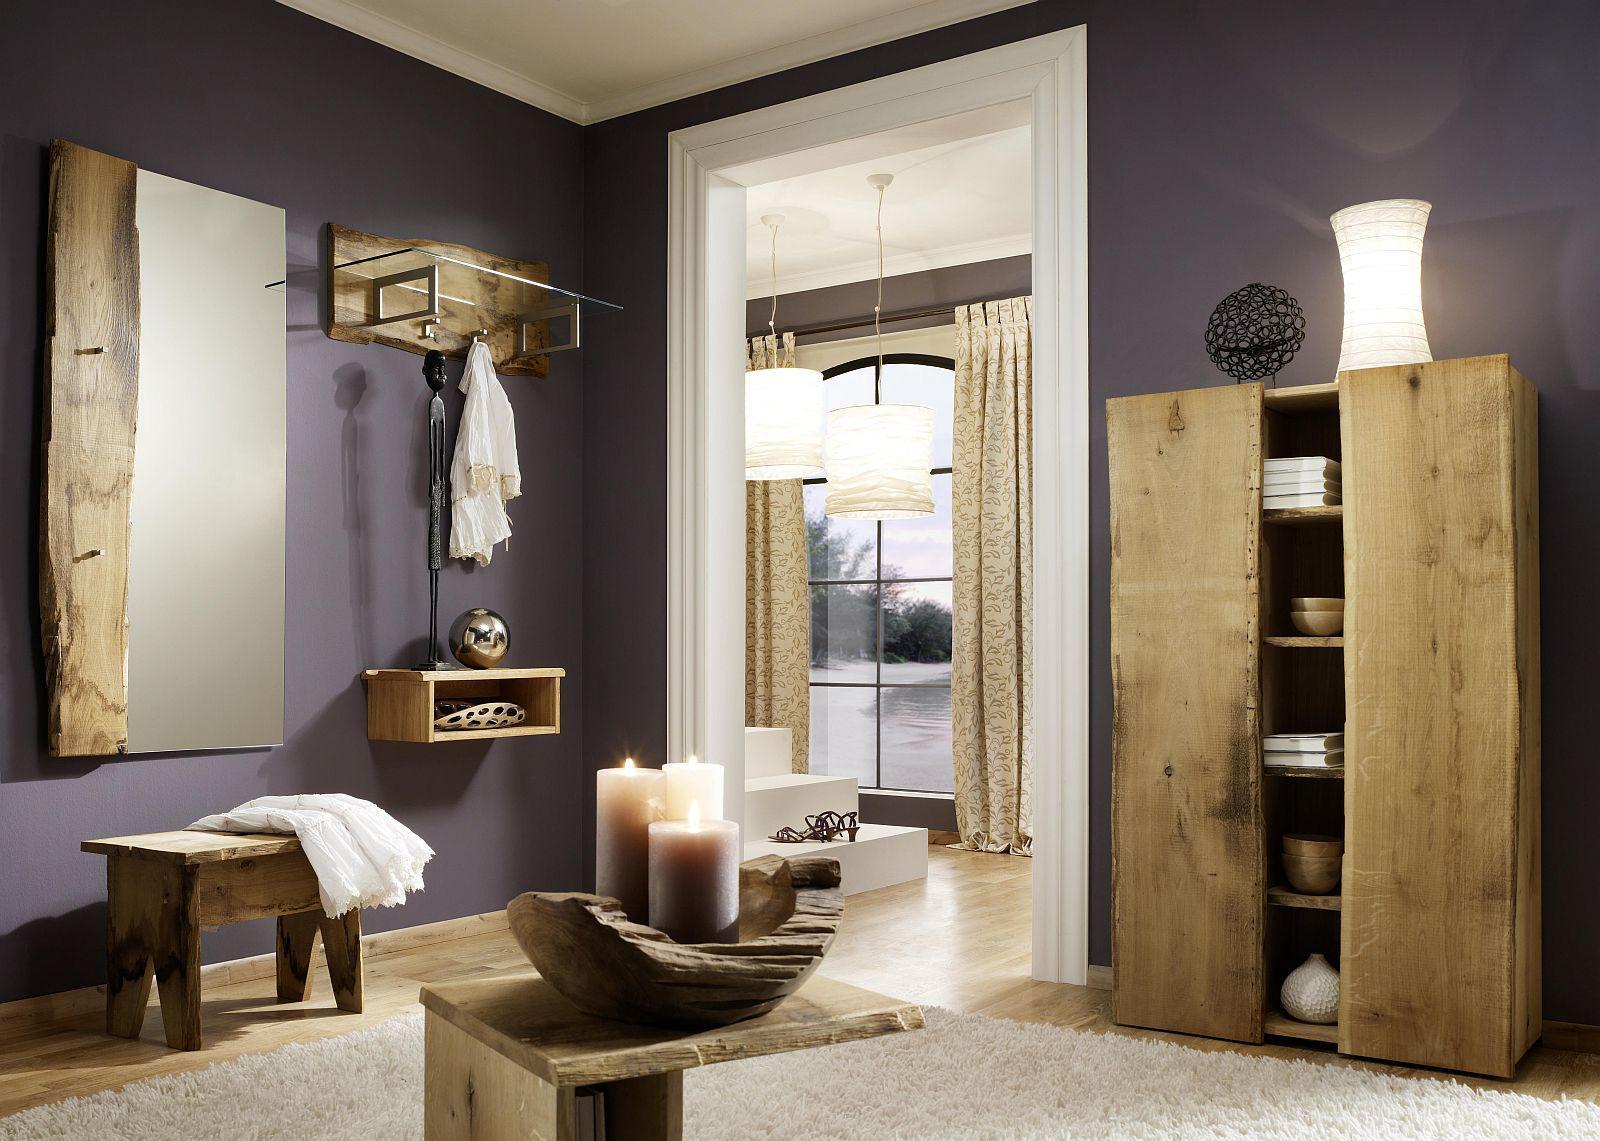 garderobe set 6 teilig landhausstil eiche massiv s gerauh. Black Bedroom Furniture Sets. Home Design Ideas